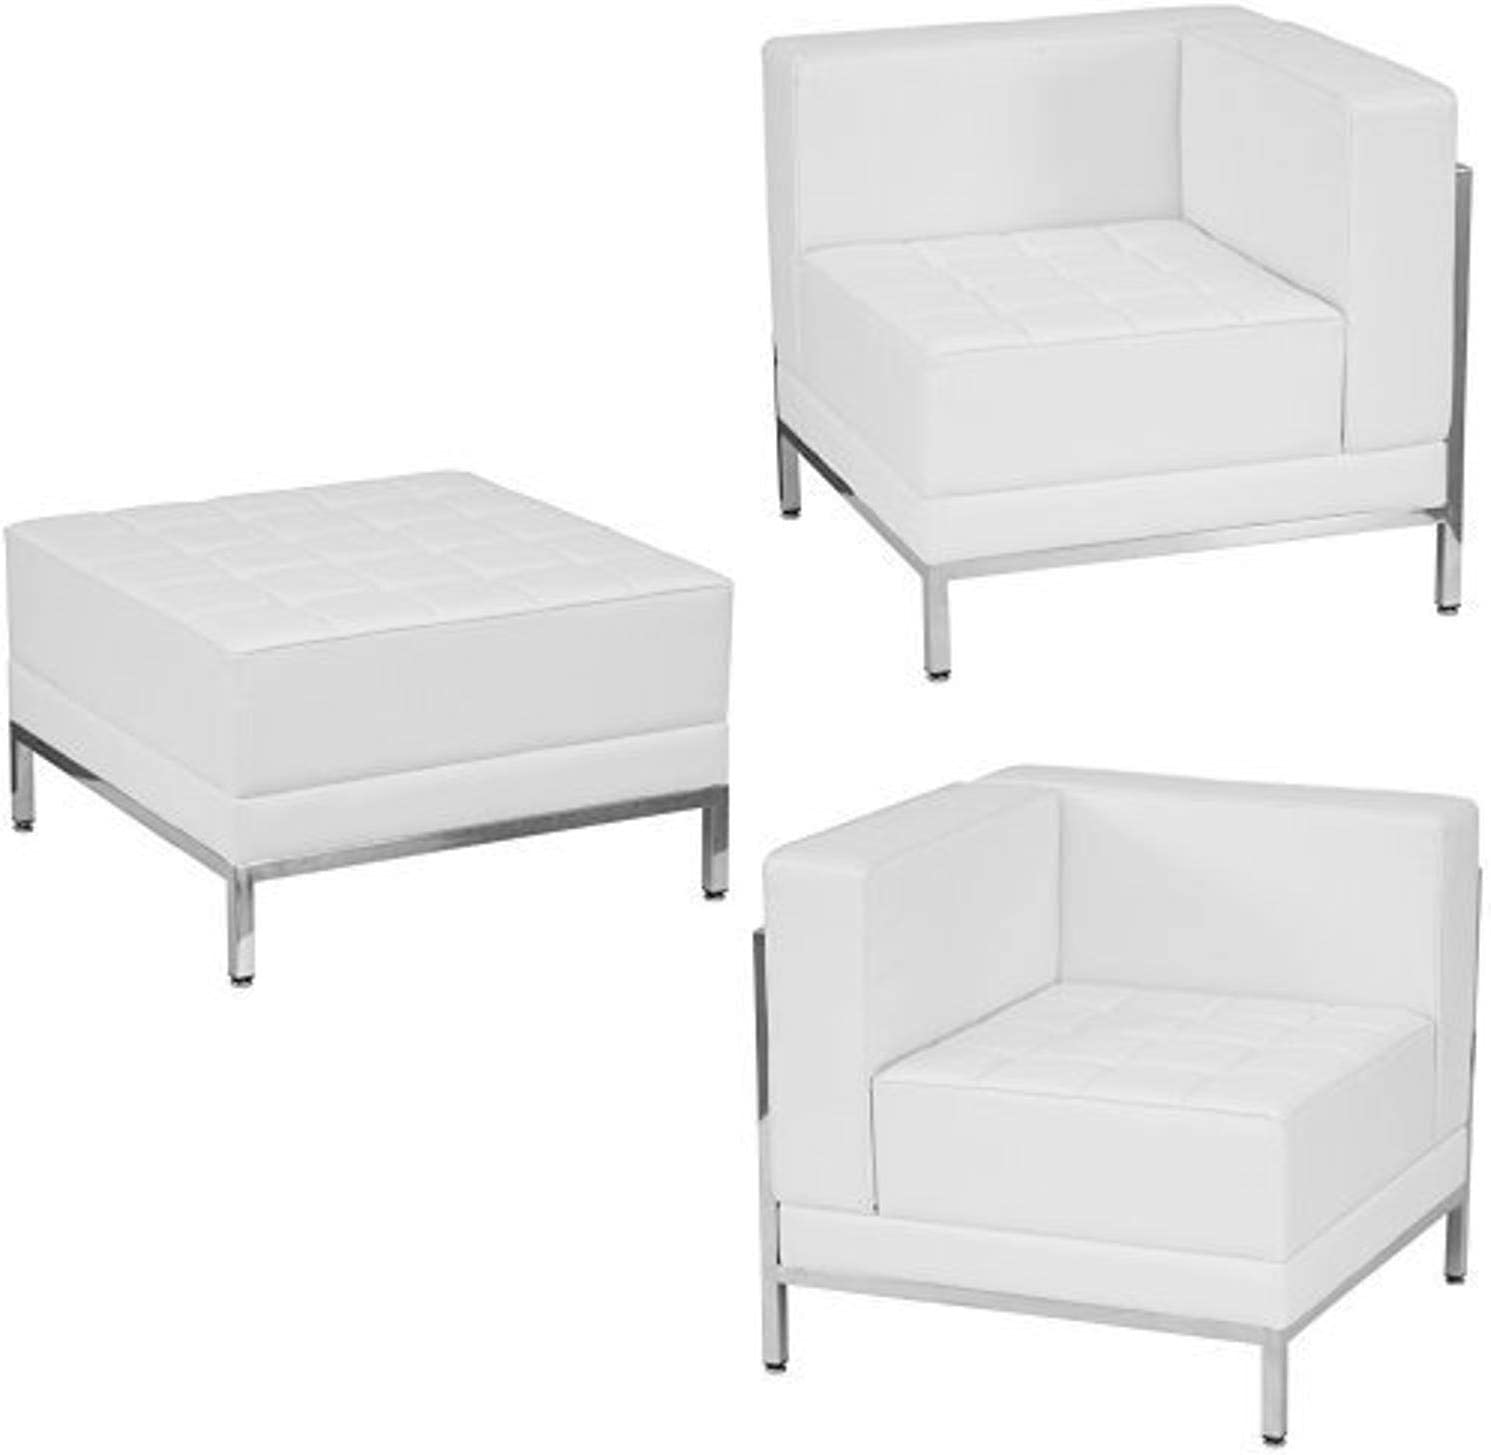 Flash Furniture HERCULES Imagination Series Melrose White Leather 4 Piece Chair & Ottoman Set